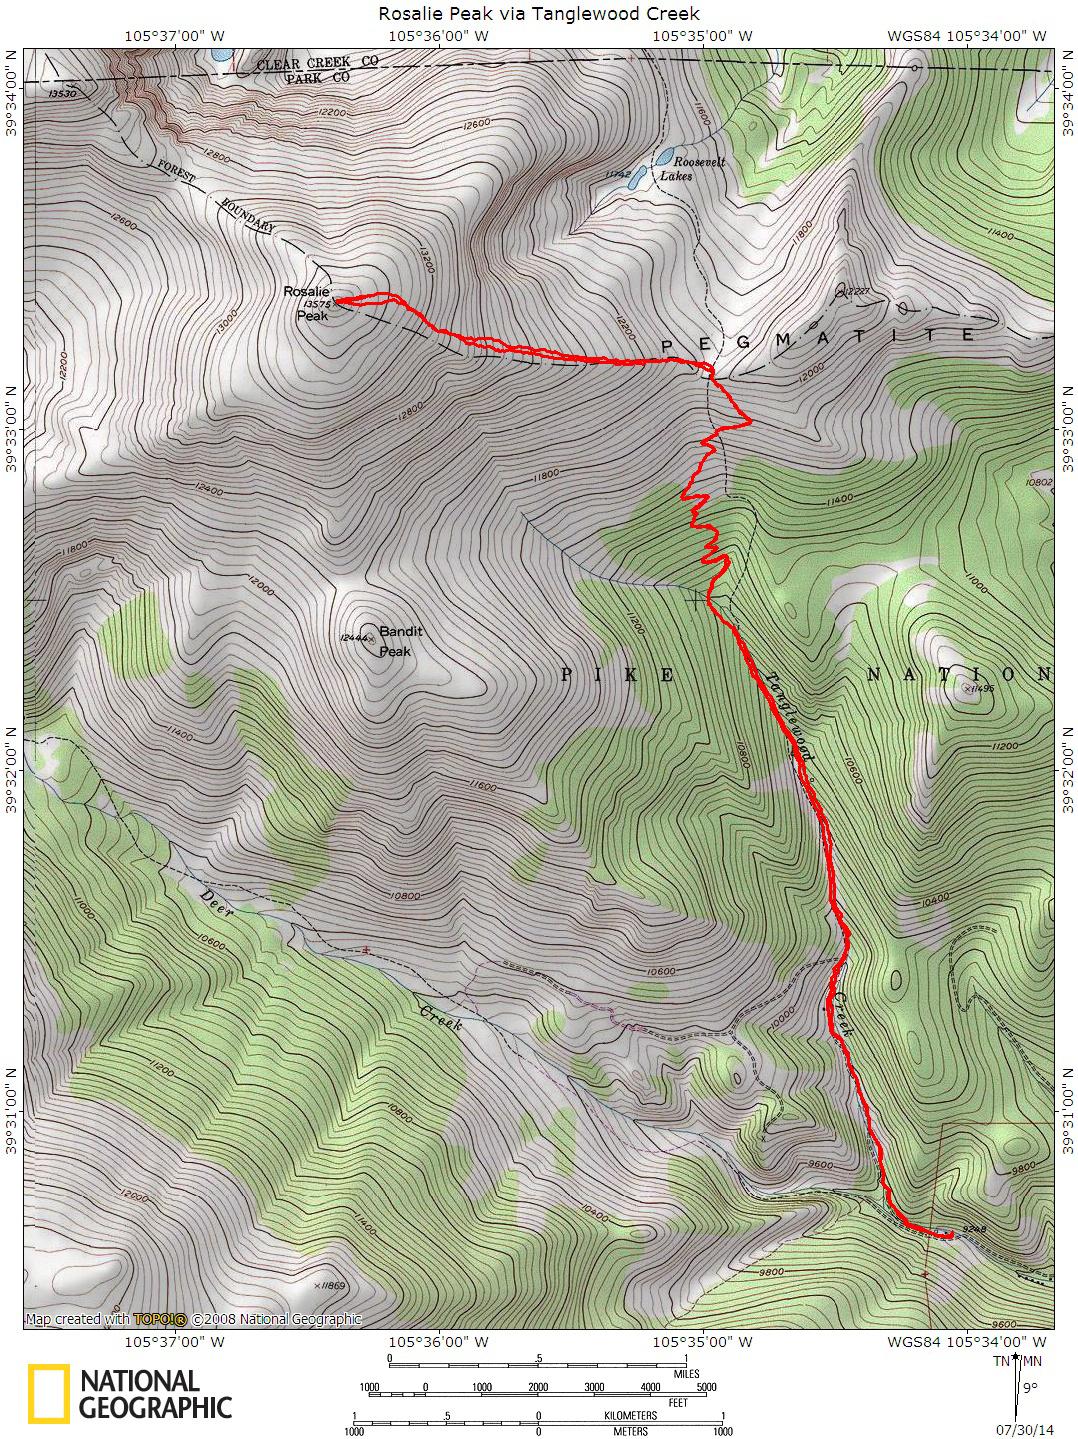 Rosalie Peak via Tanglewood Creek - Mountain Air